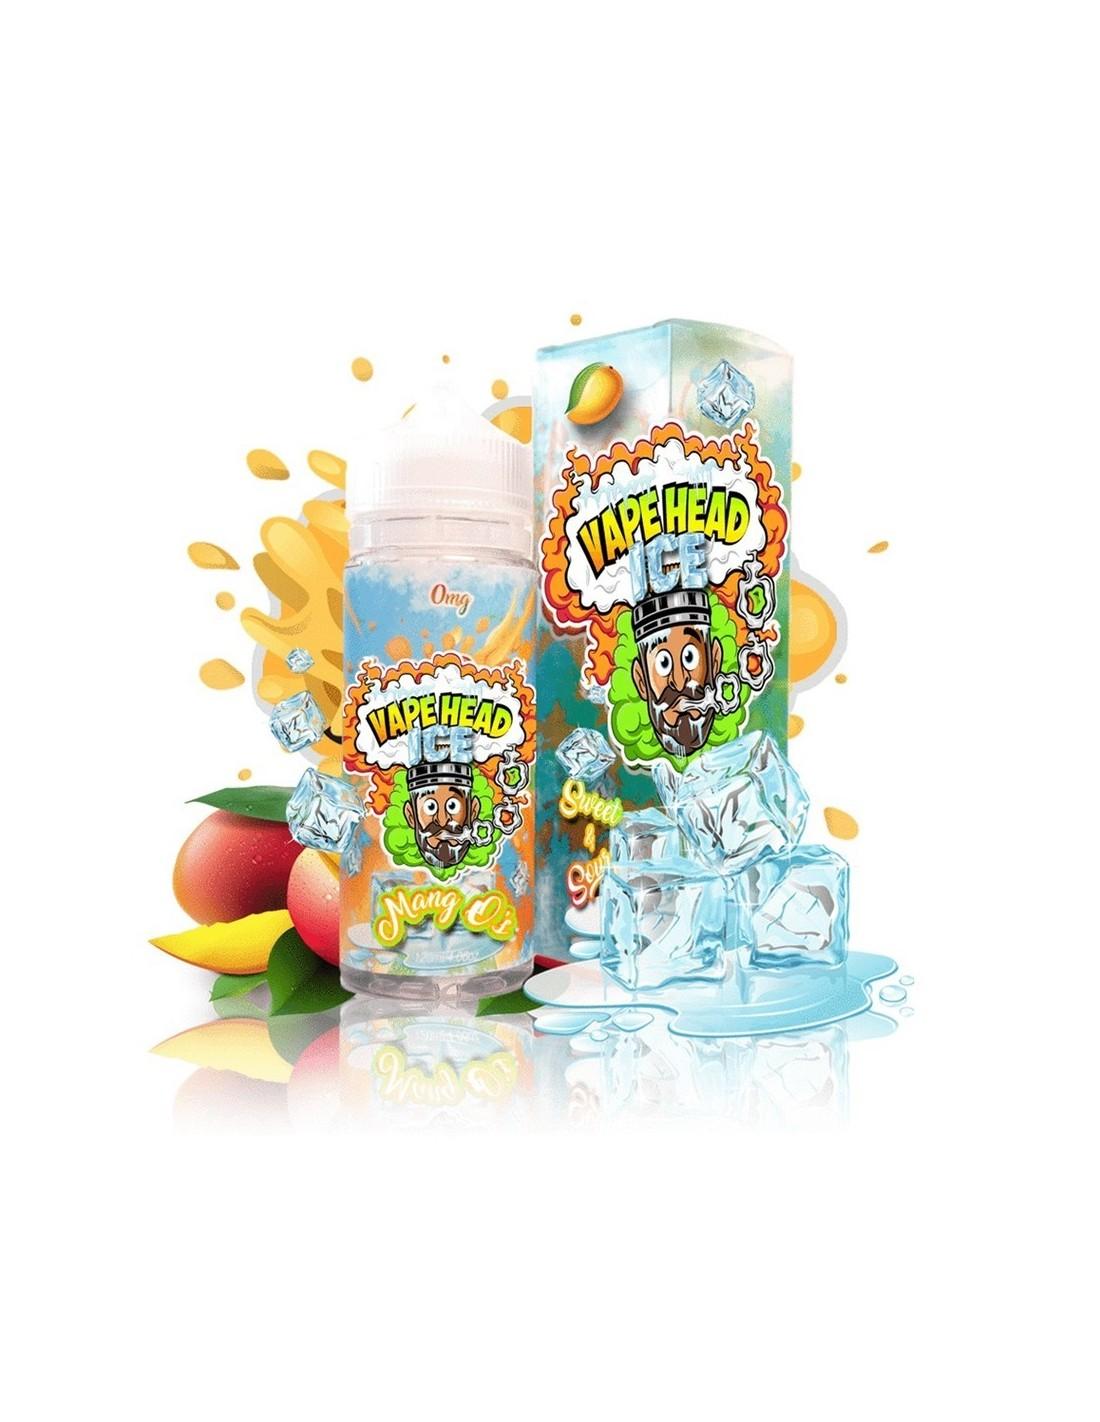 Vape Heads Premium VG E-liquid E-juice 120ml(0mg/ml, Ice Mang Os) | Vape Store US